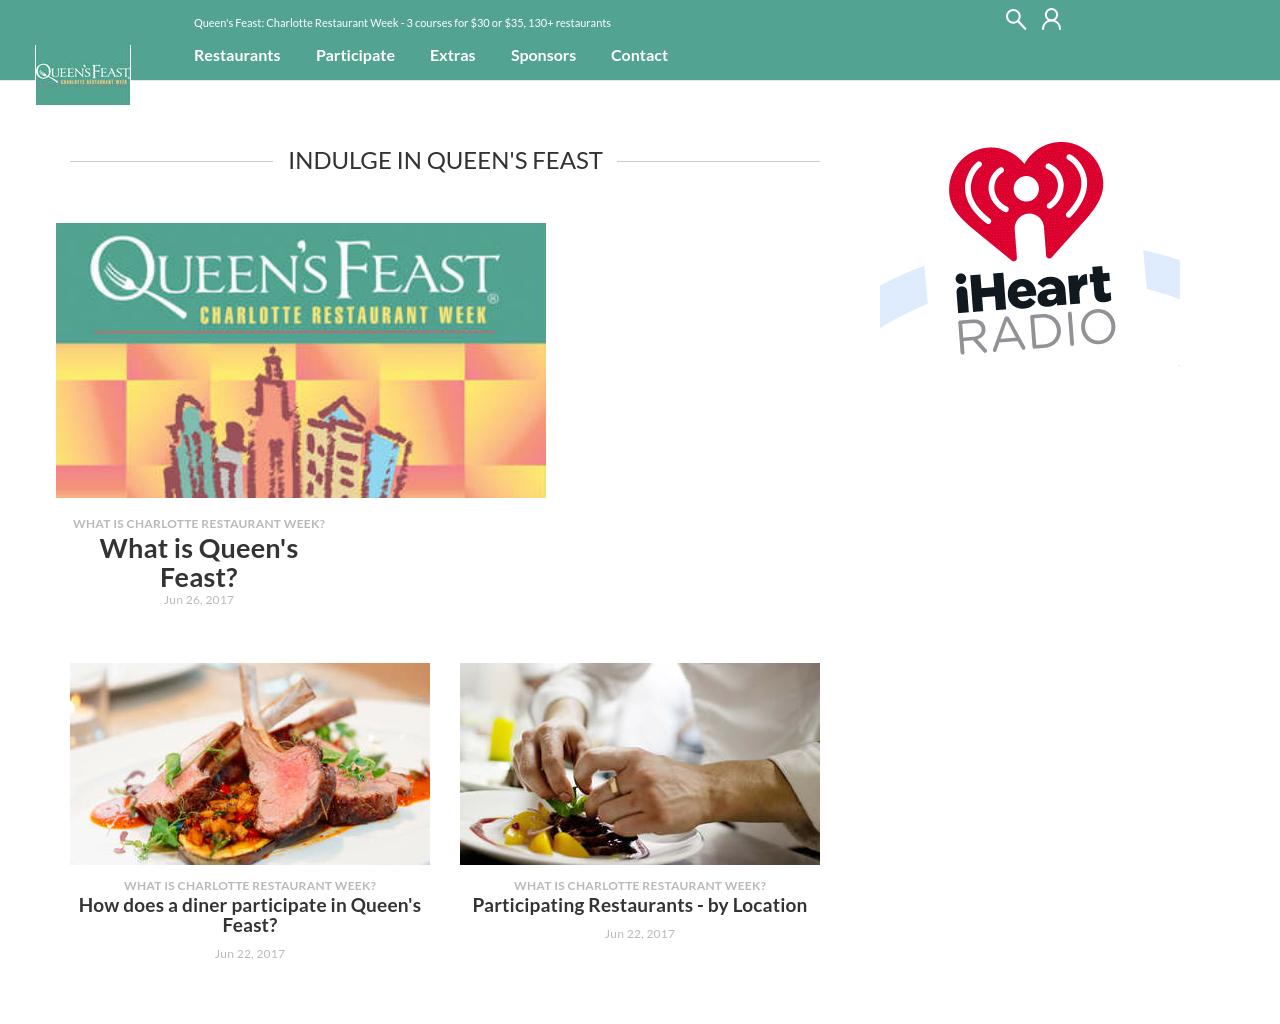 Queen's-Feast-Charlotte-Restaurant-Week-Advertising-Reviews-Pricing